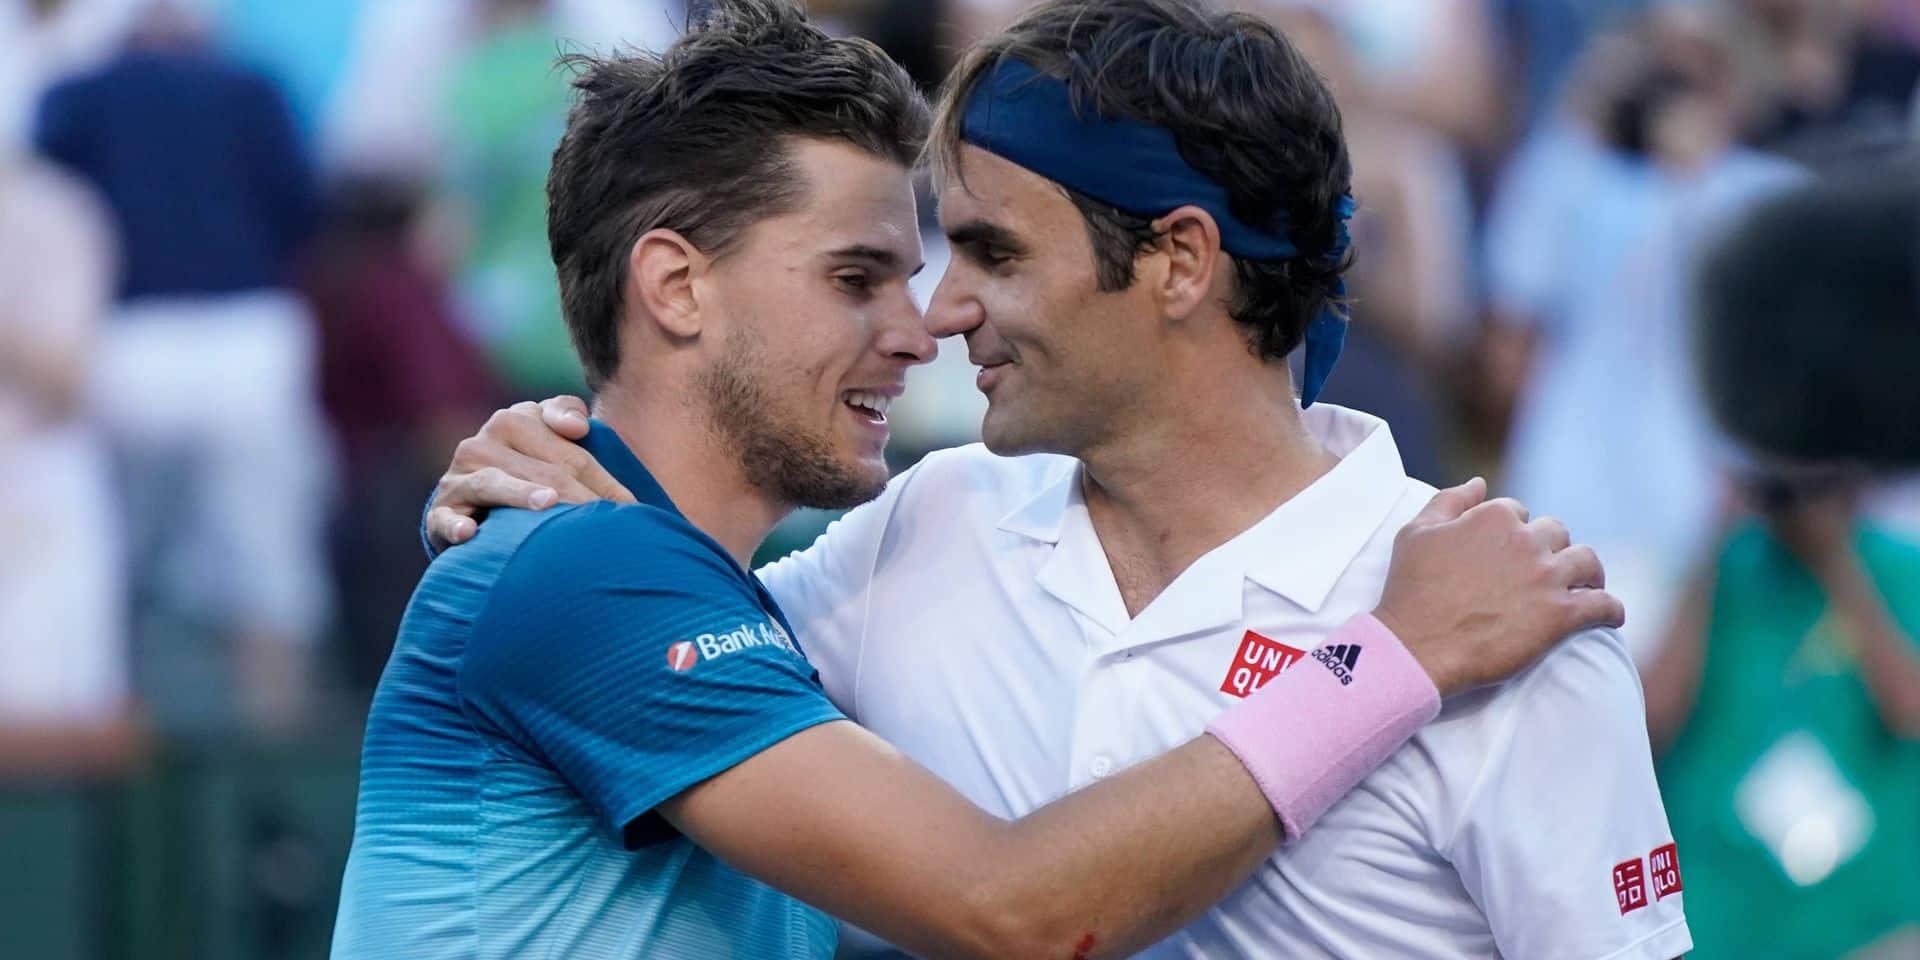 2019 Indian Wells Dominic Thiem , Austria, beats Roger Federer, Switzerland to win the Indian Wells Tournament 2019 ***